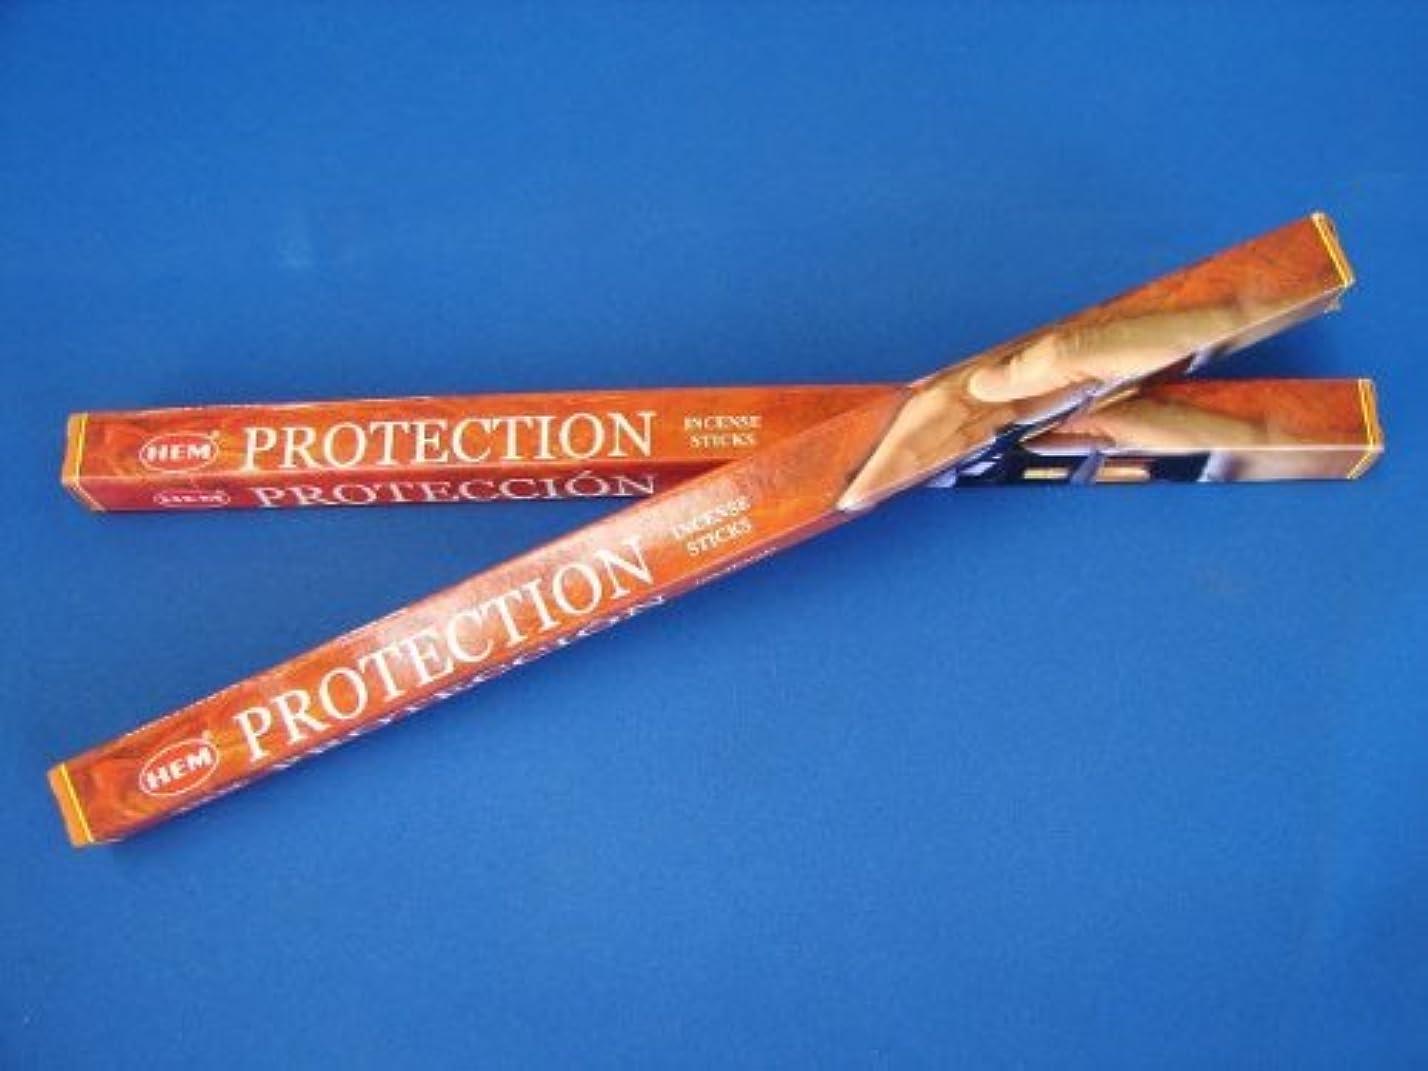 4 Boxes of HEM Incense Sticks - Protection